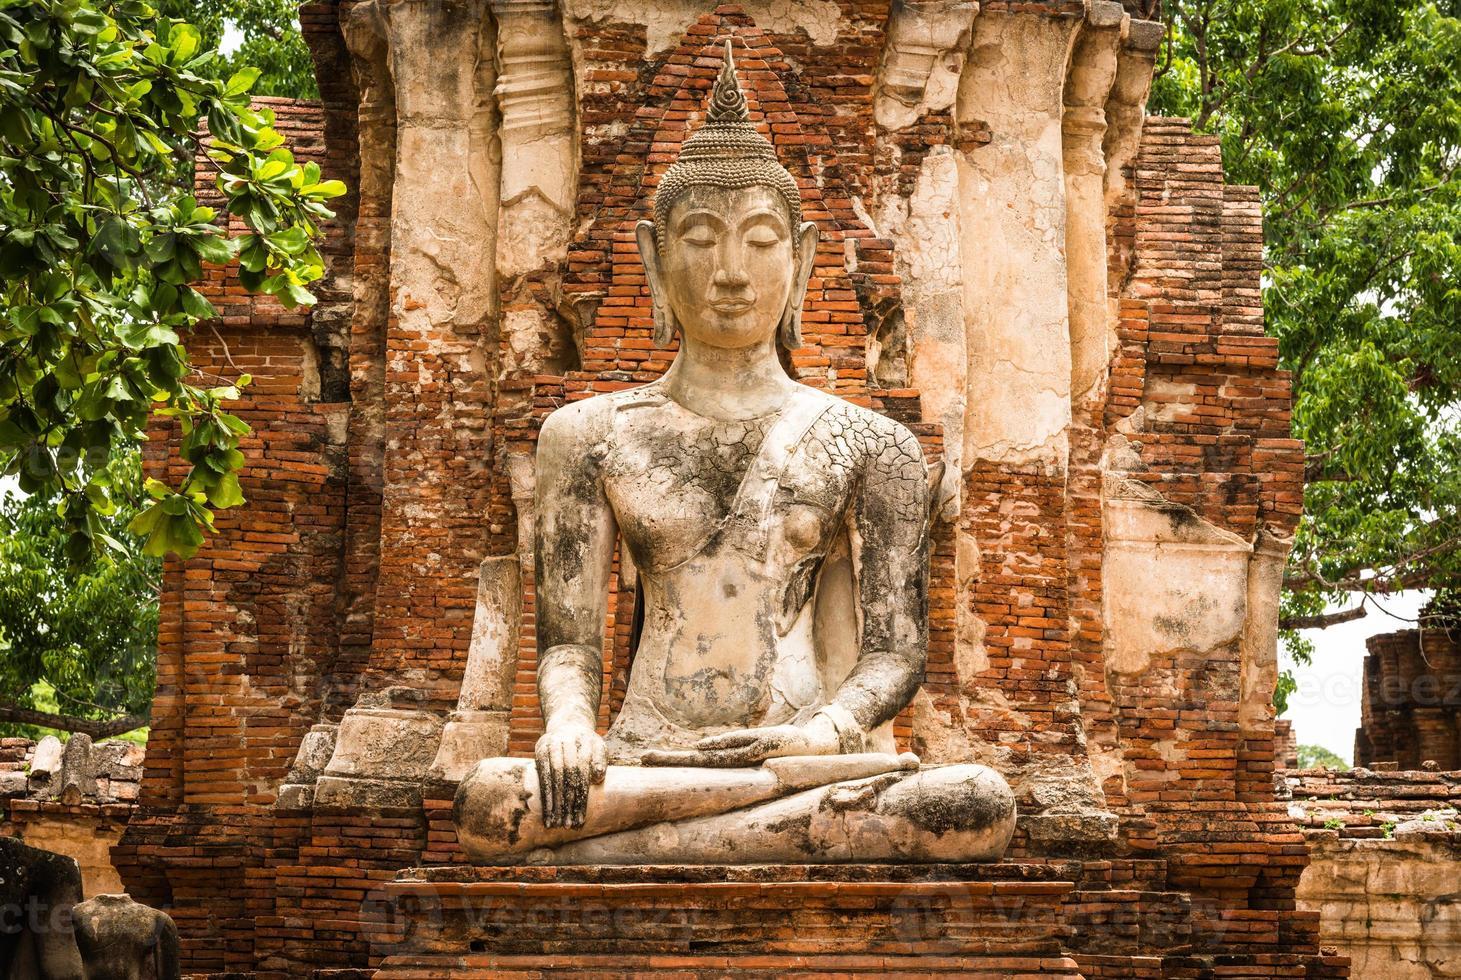 antigua estatua de Buda y arquitectura del antiguo templo foto